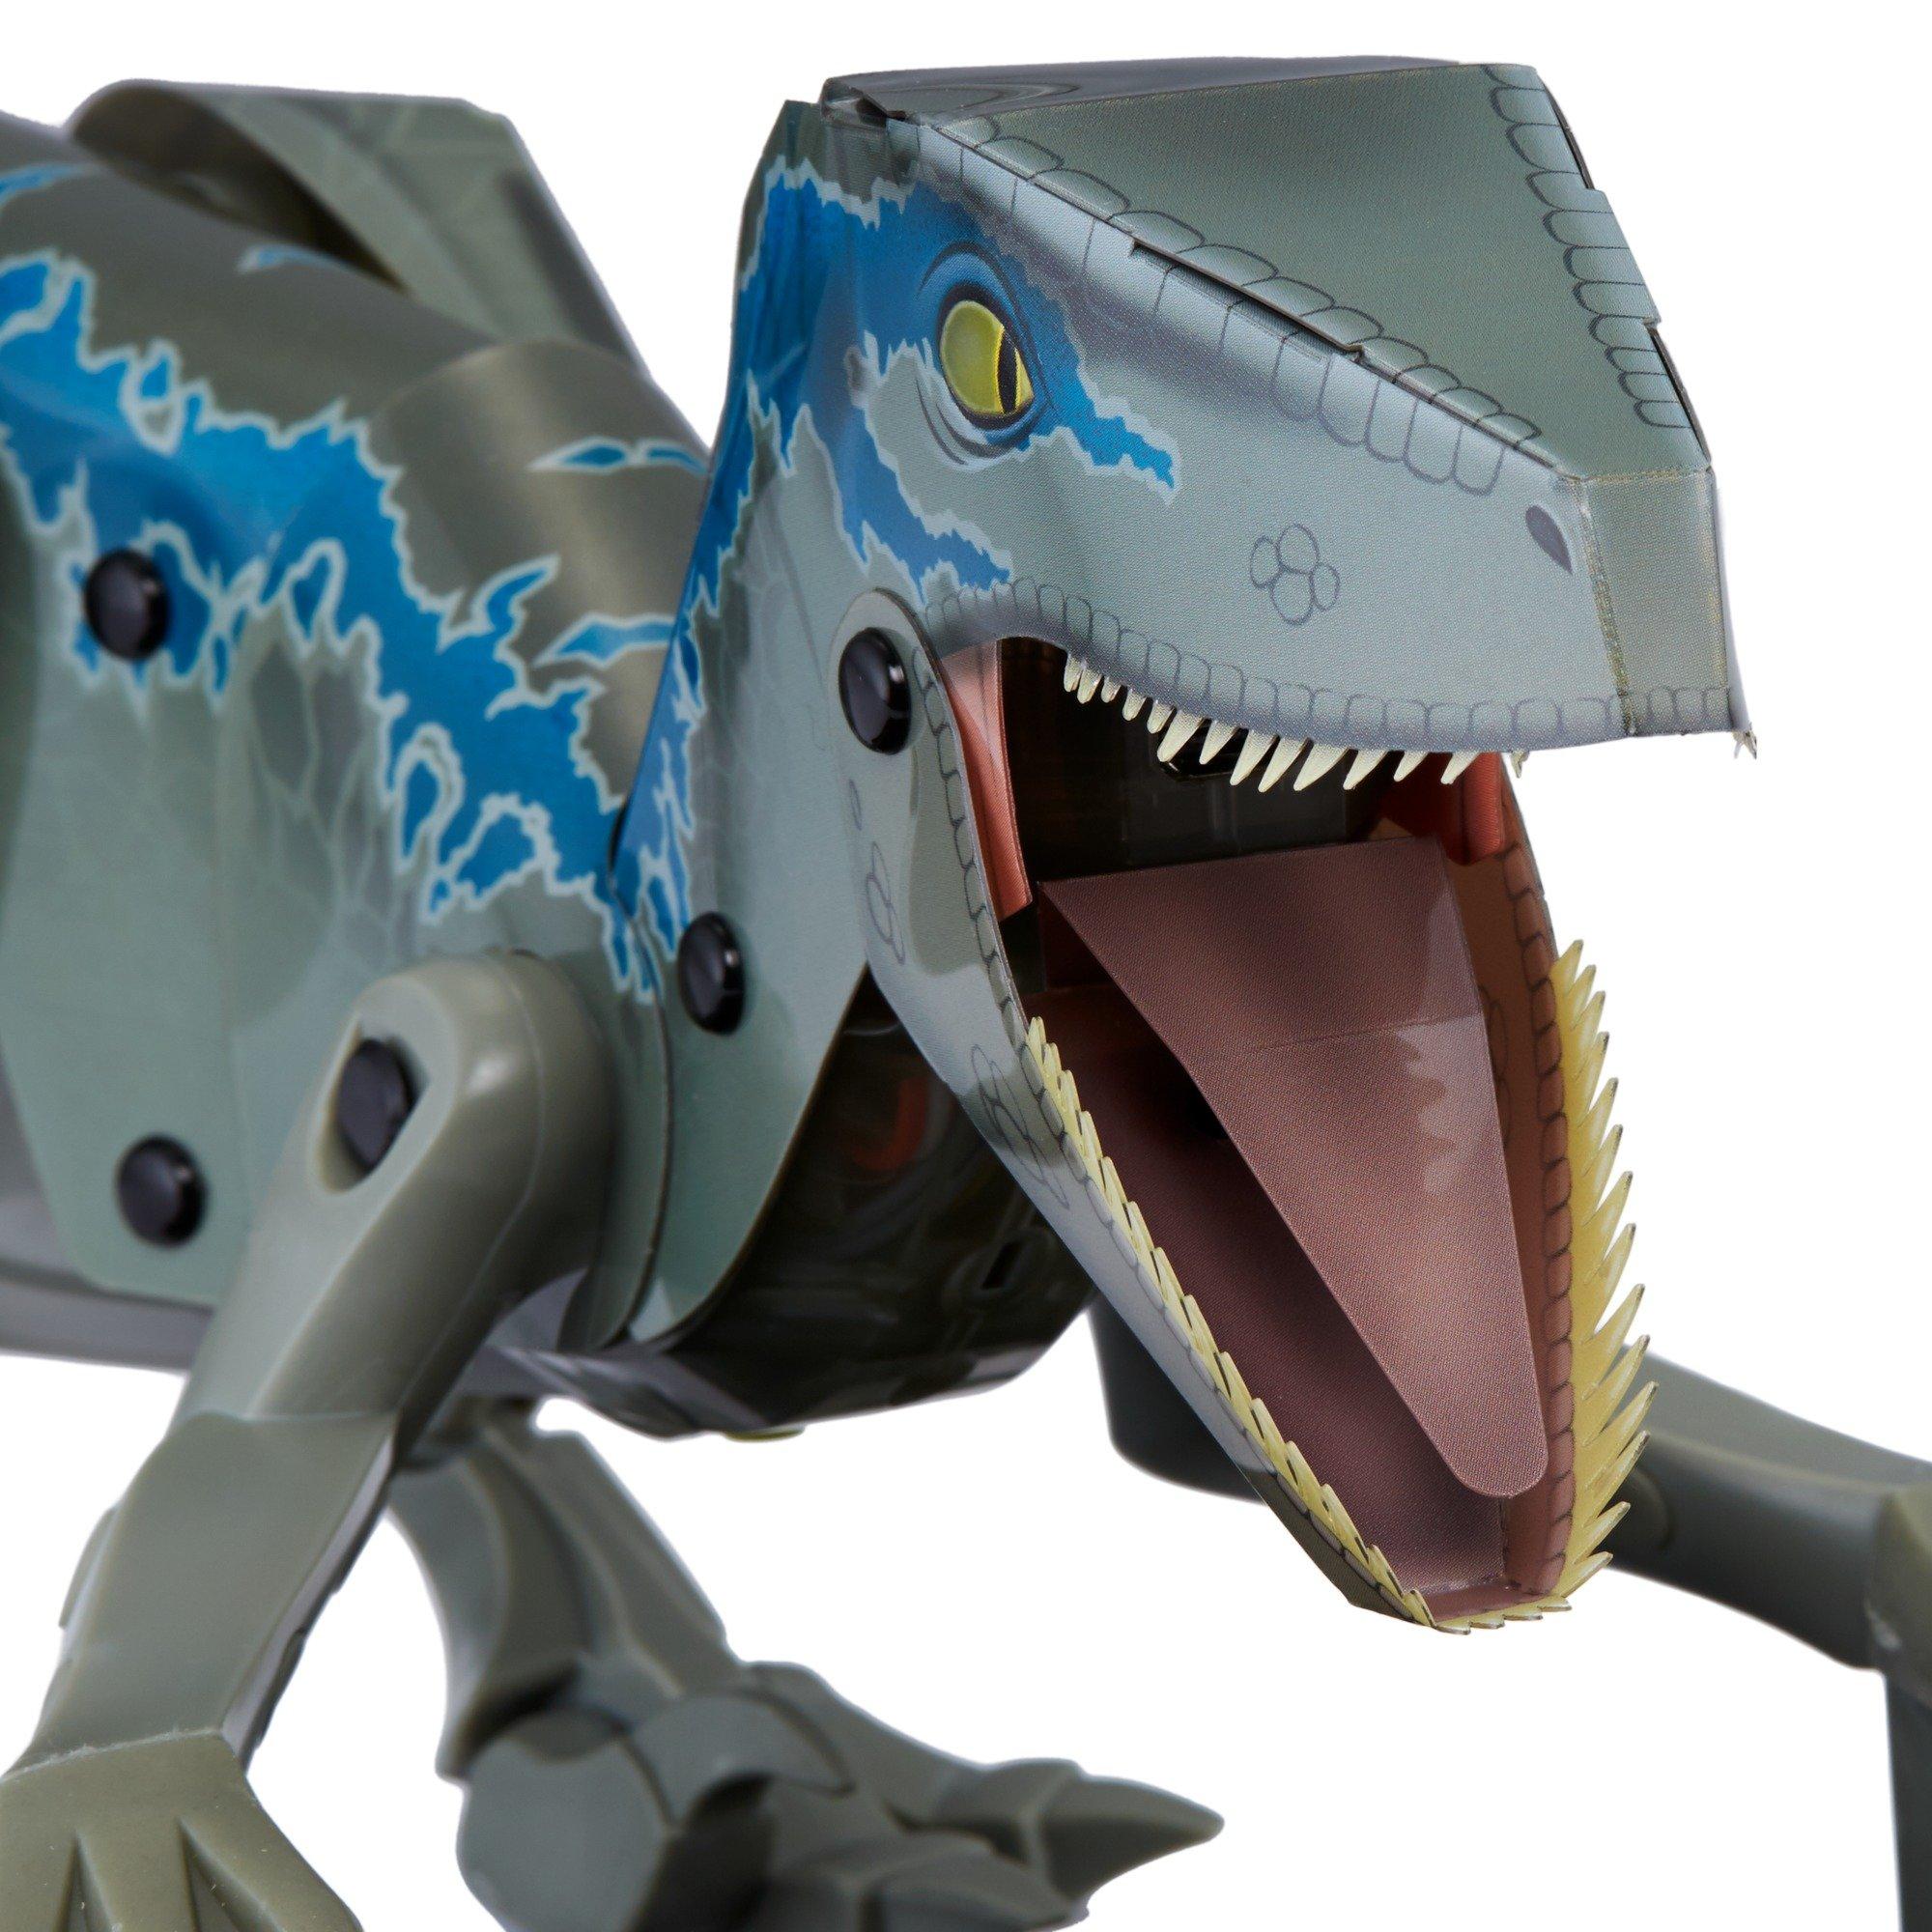 Kamigami Jurassic World Blue Robot by Jurassic World Toys (Image #2)